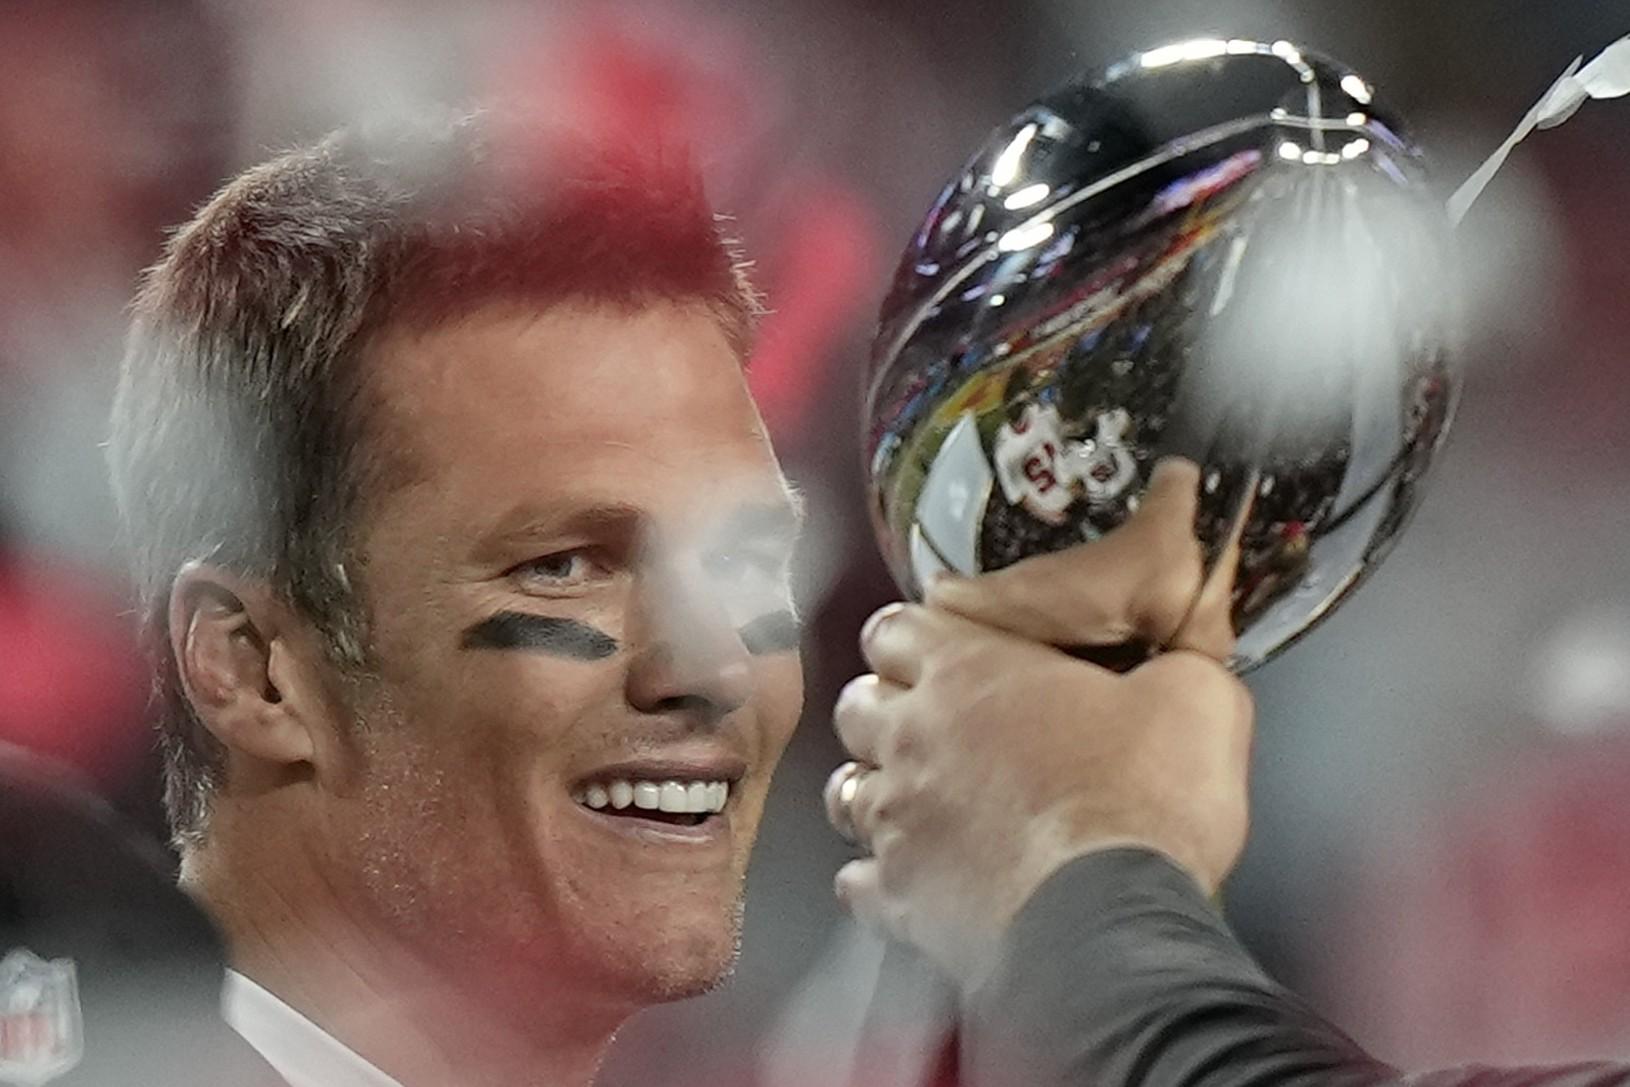 Quarterback Buccaneers Tom Brady